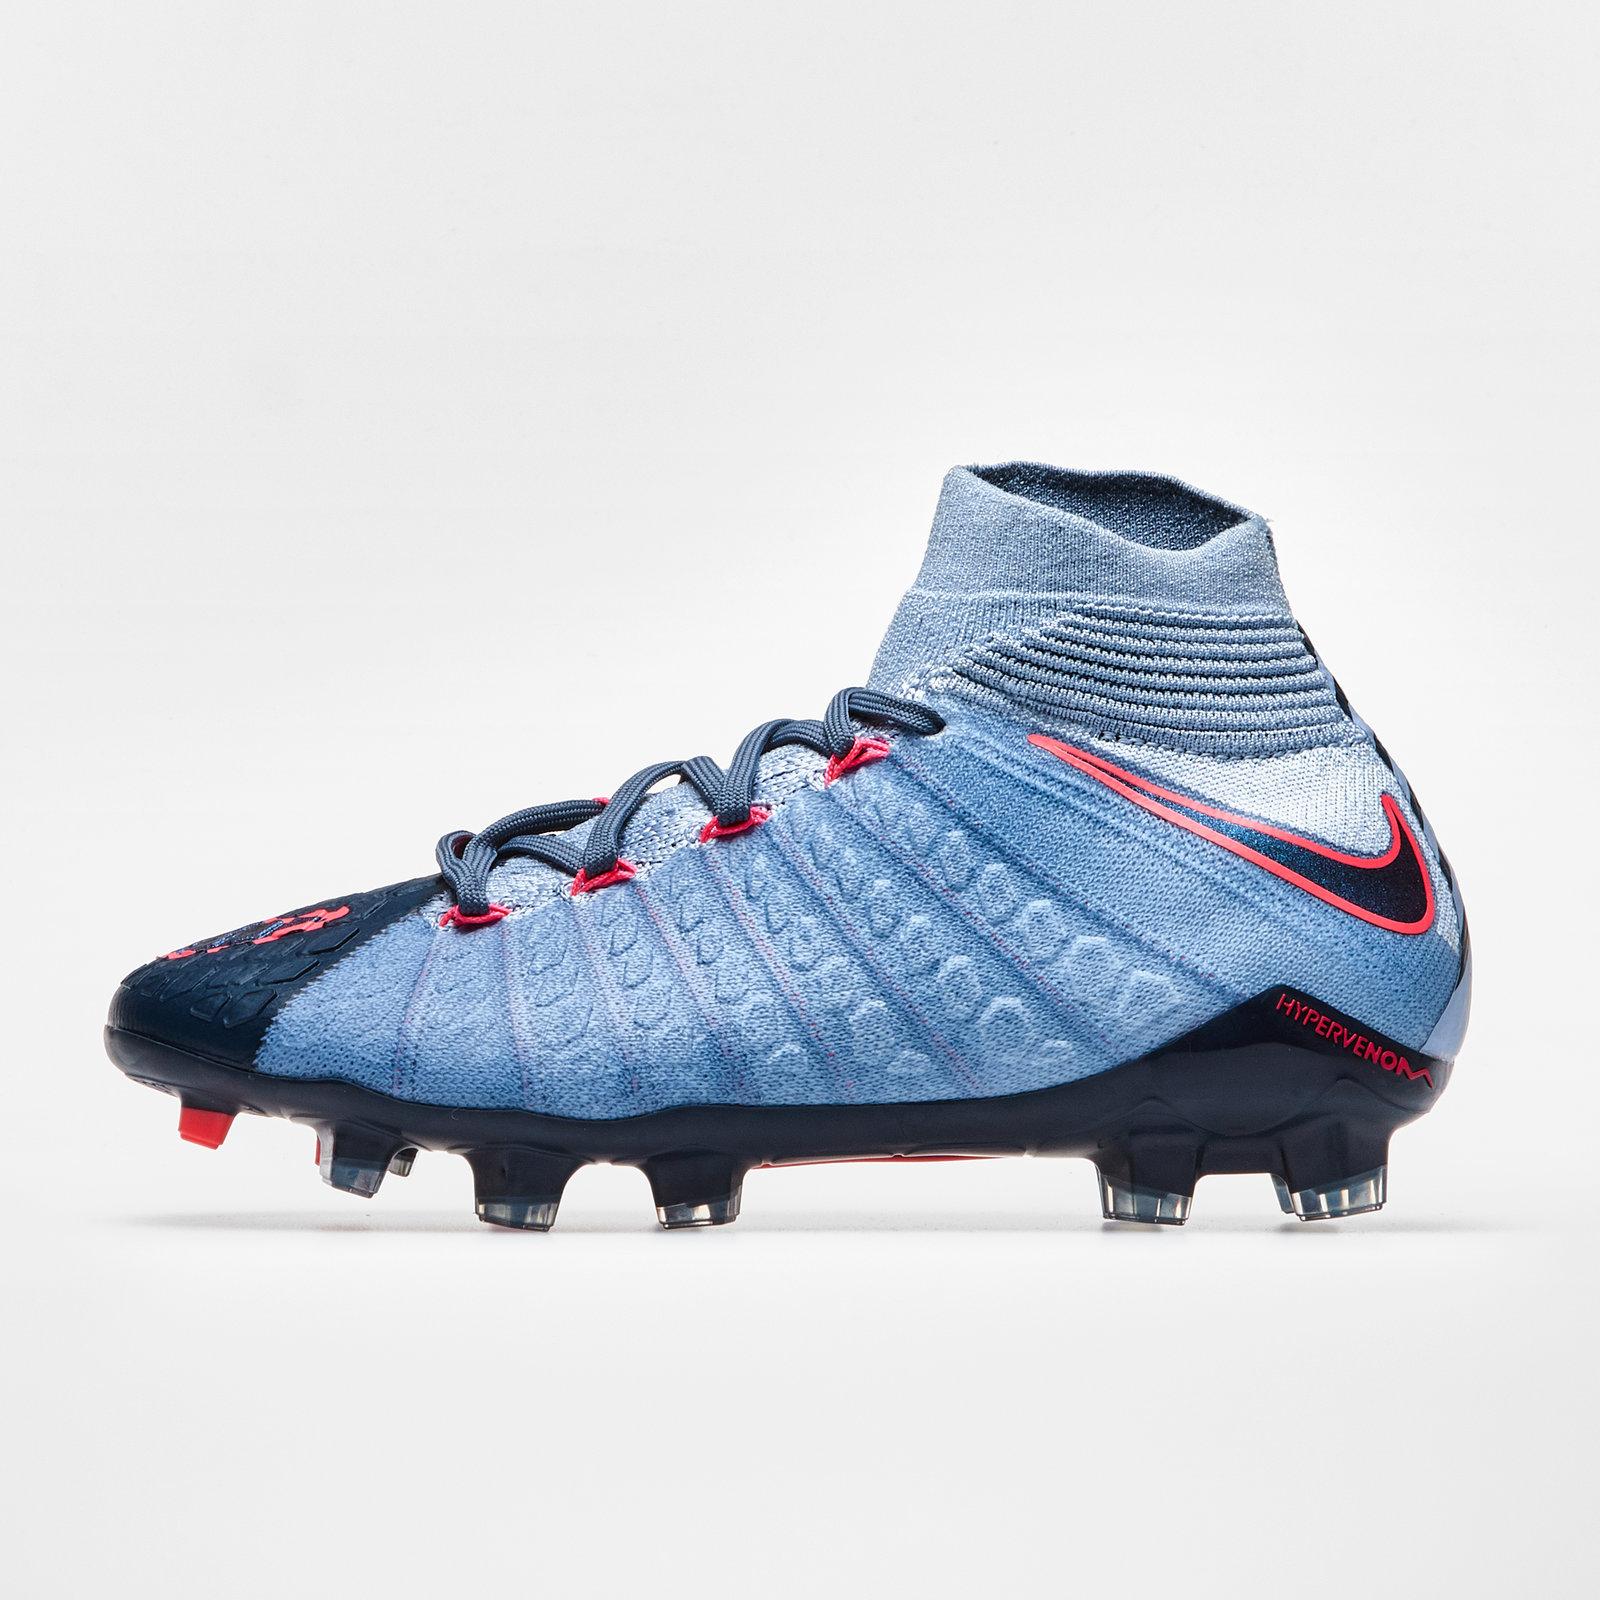 d7d6295de Nike Unisex Hypervenom Phantom III Dynamic Fit Kids FG Football Boots